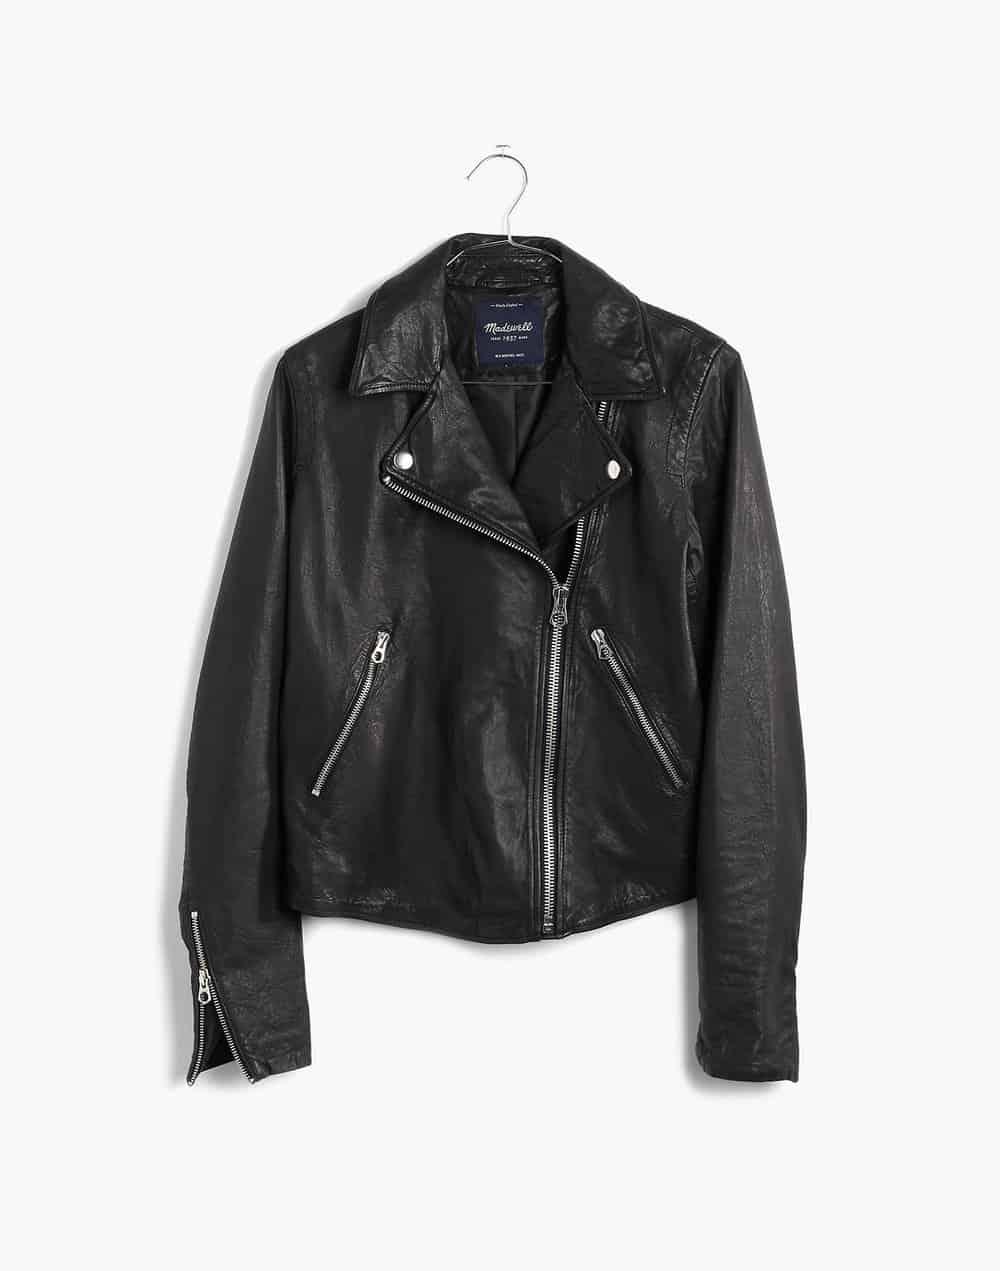 leather jacket for paris france everyday parisian